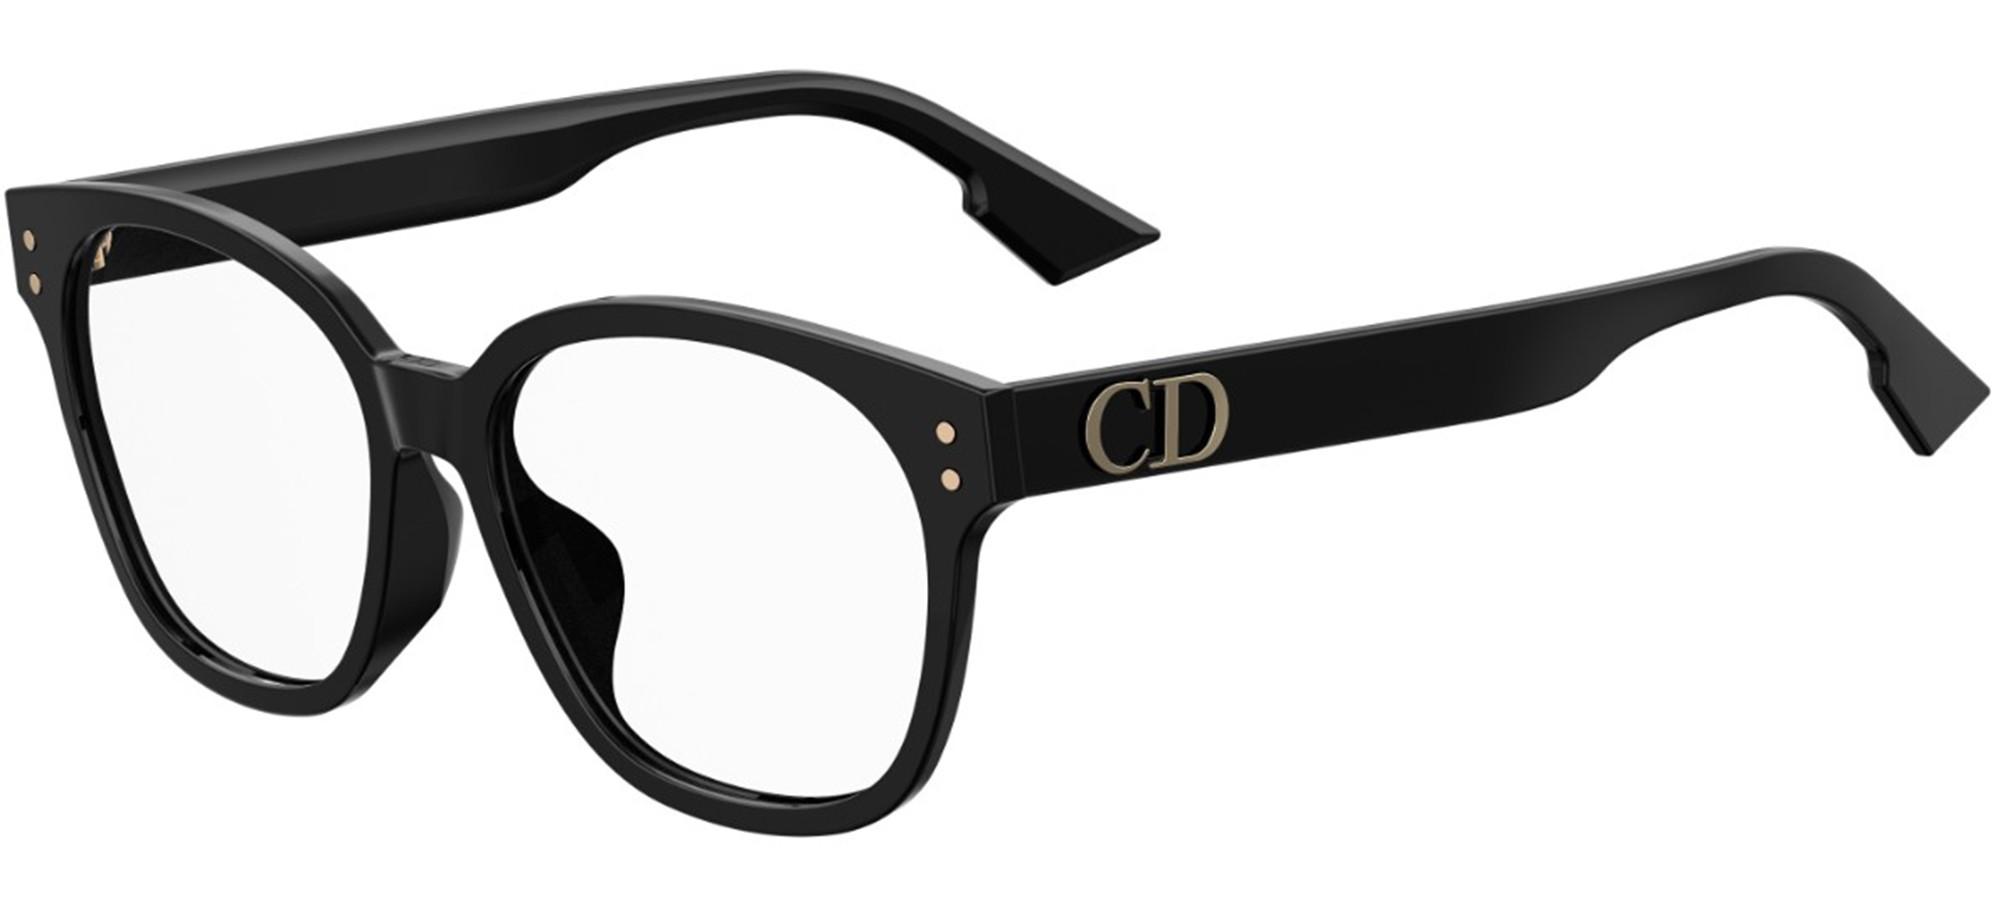 Dior briller DIOR CD 1F